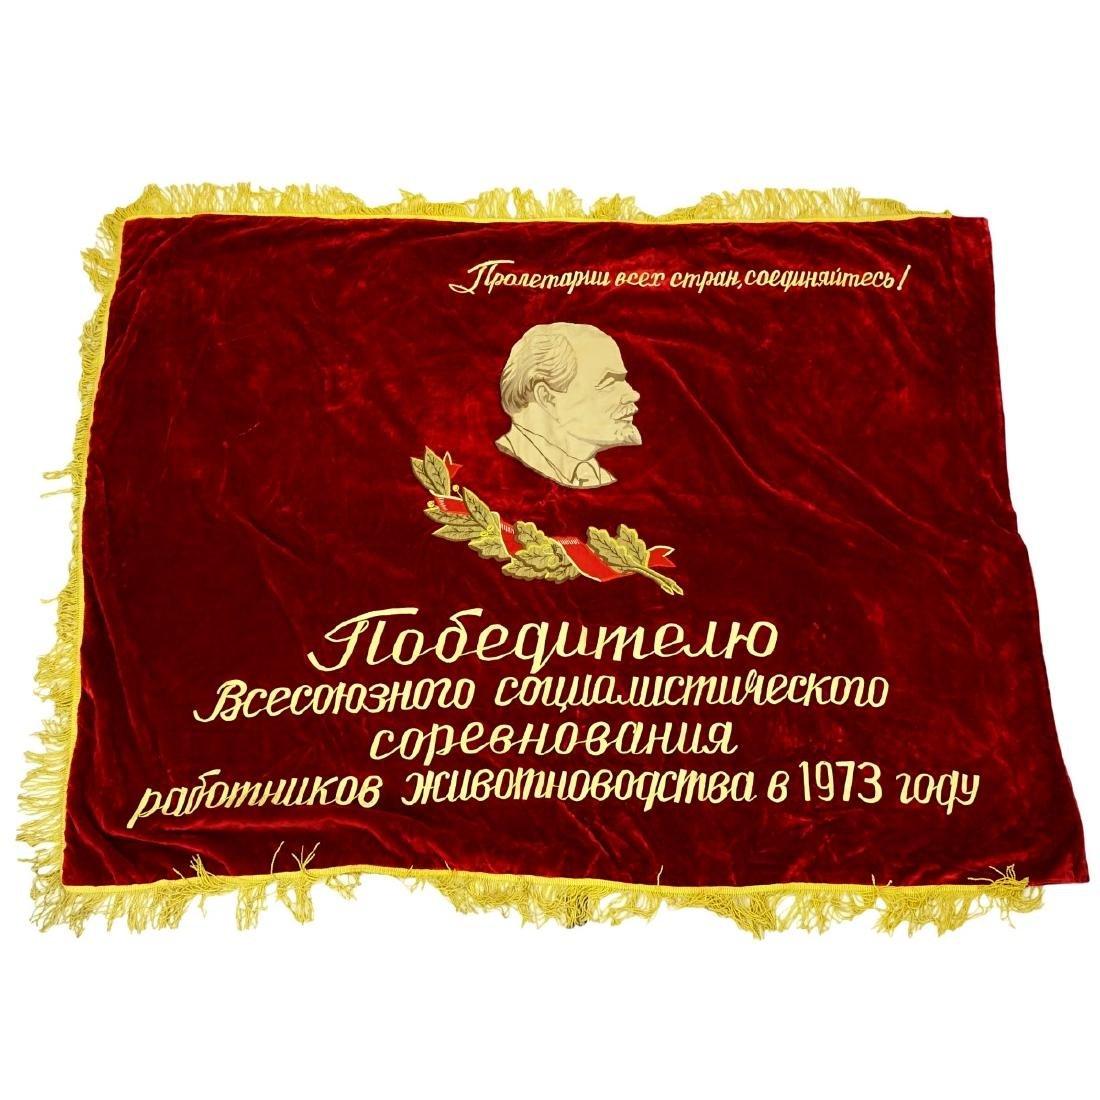 20th Century Russian Soviet Era Lenin-CCCP